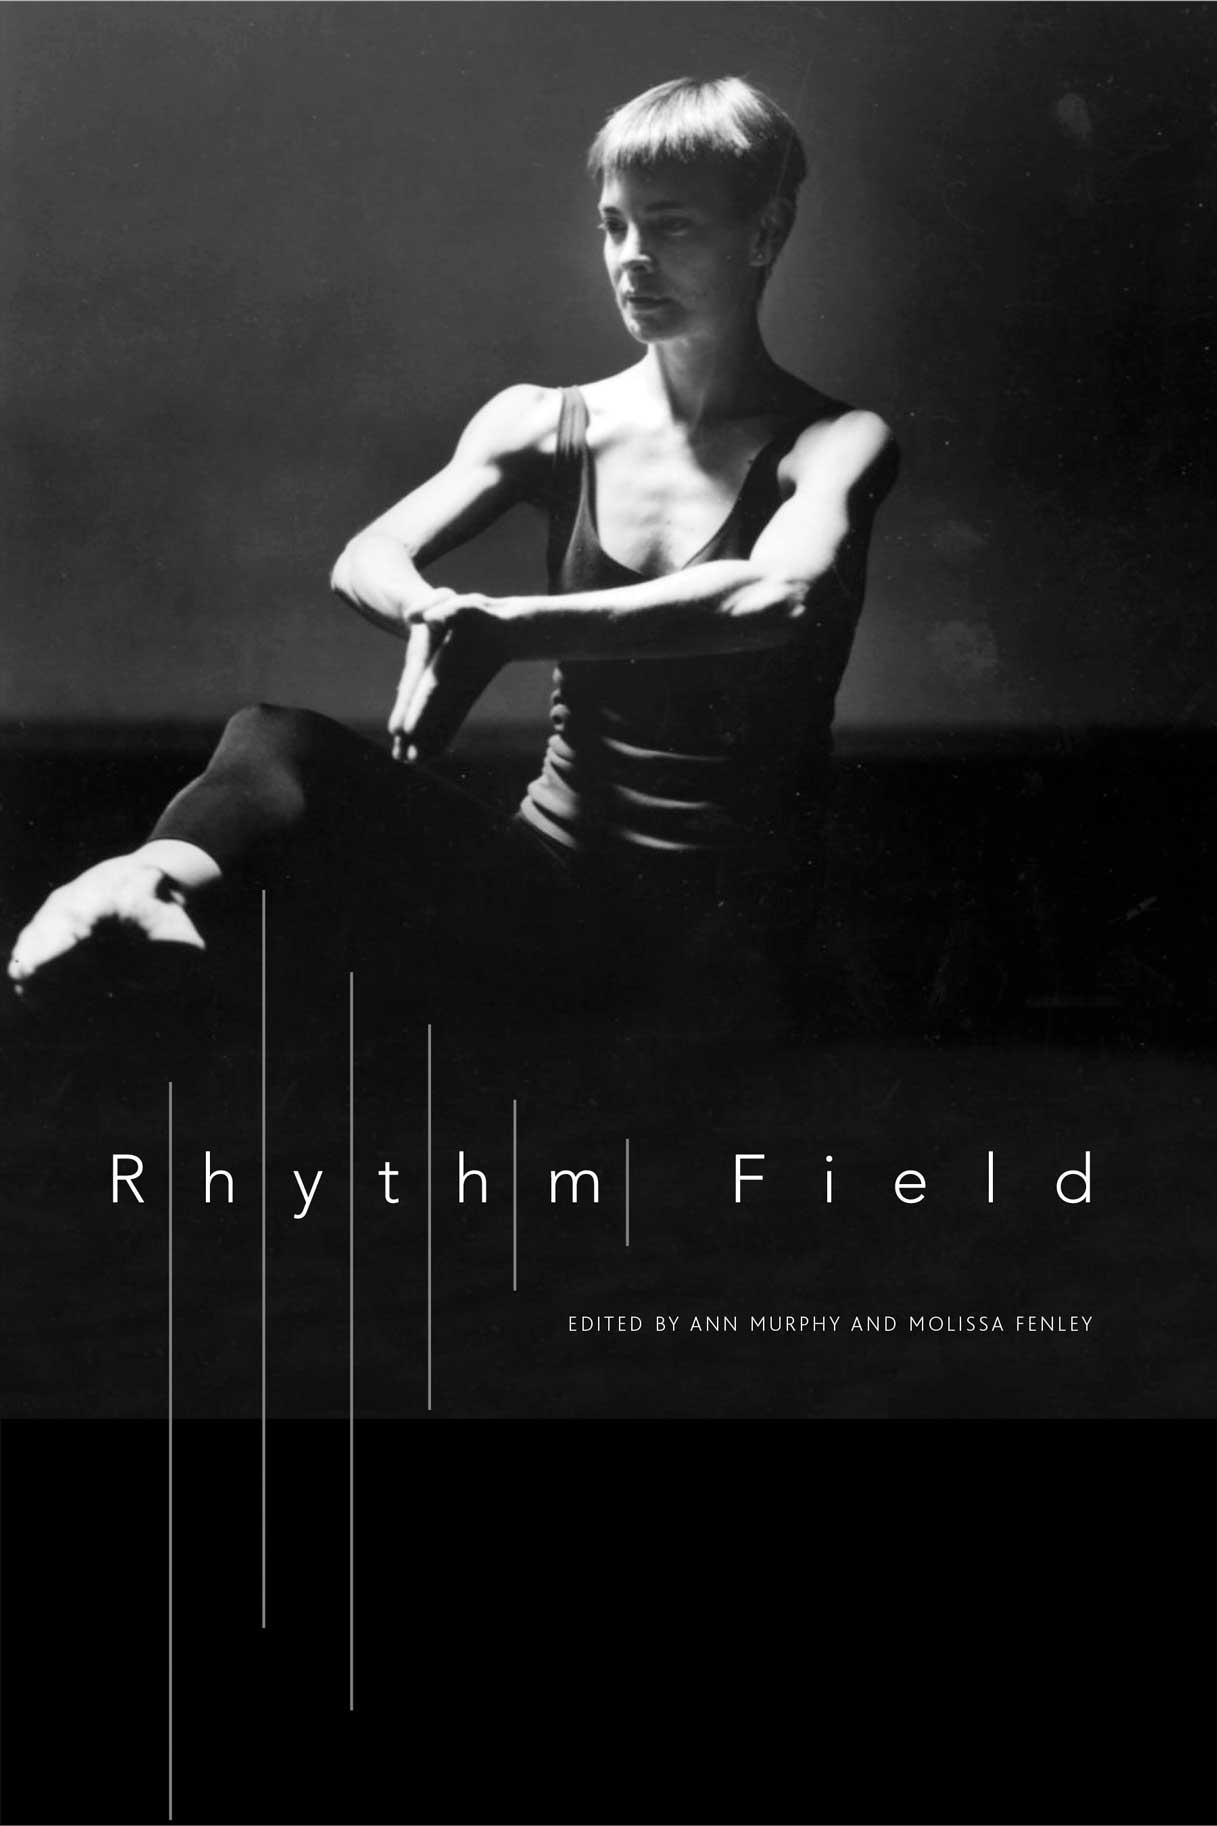 Rhythm Field: The Dance of Molissa Fenley by Ann Murphy and Molissa Fenley |  Seagull Books